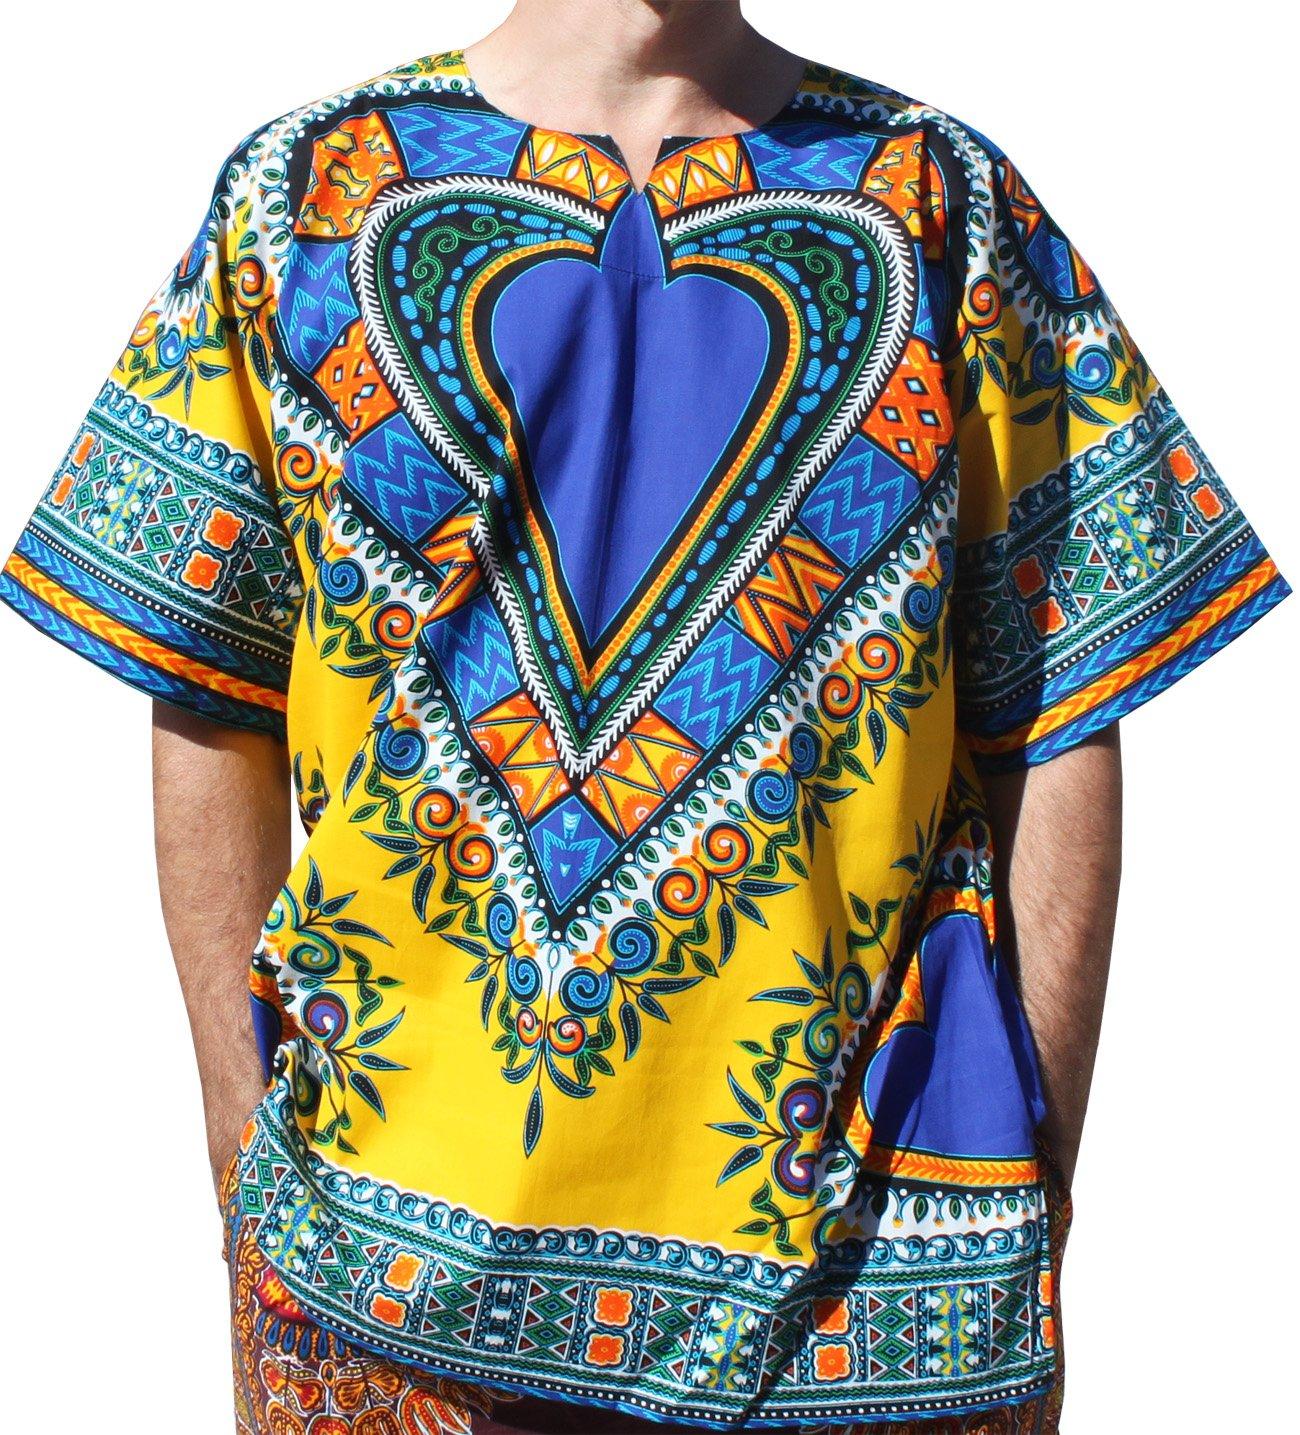 RaanPahMuang Bright Heart Cotton Africa Dashiki Plus Sized Shirt Plain Front, XXX-Large, Yellow by RaanPahMuang